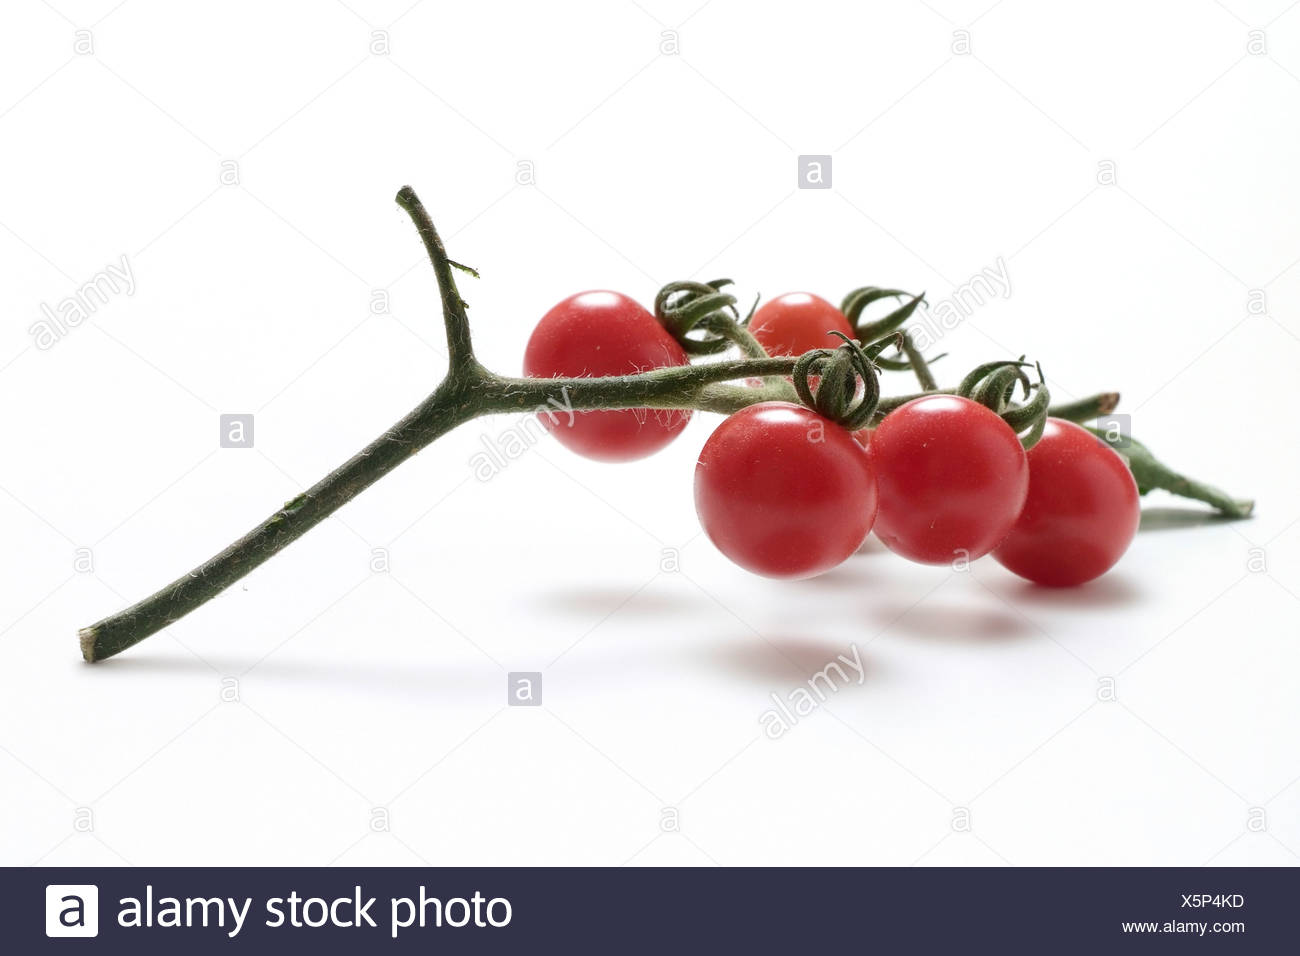 Tomato varieties:  Wild Cherrytomato - Stock Image